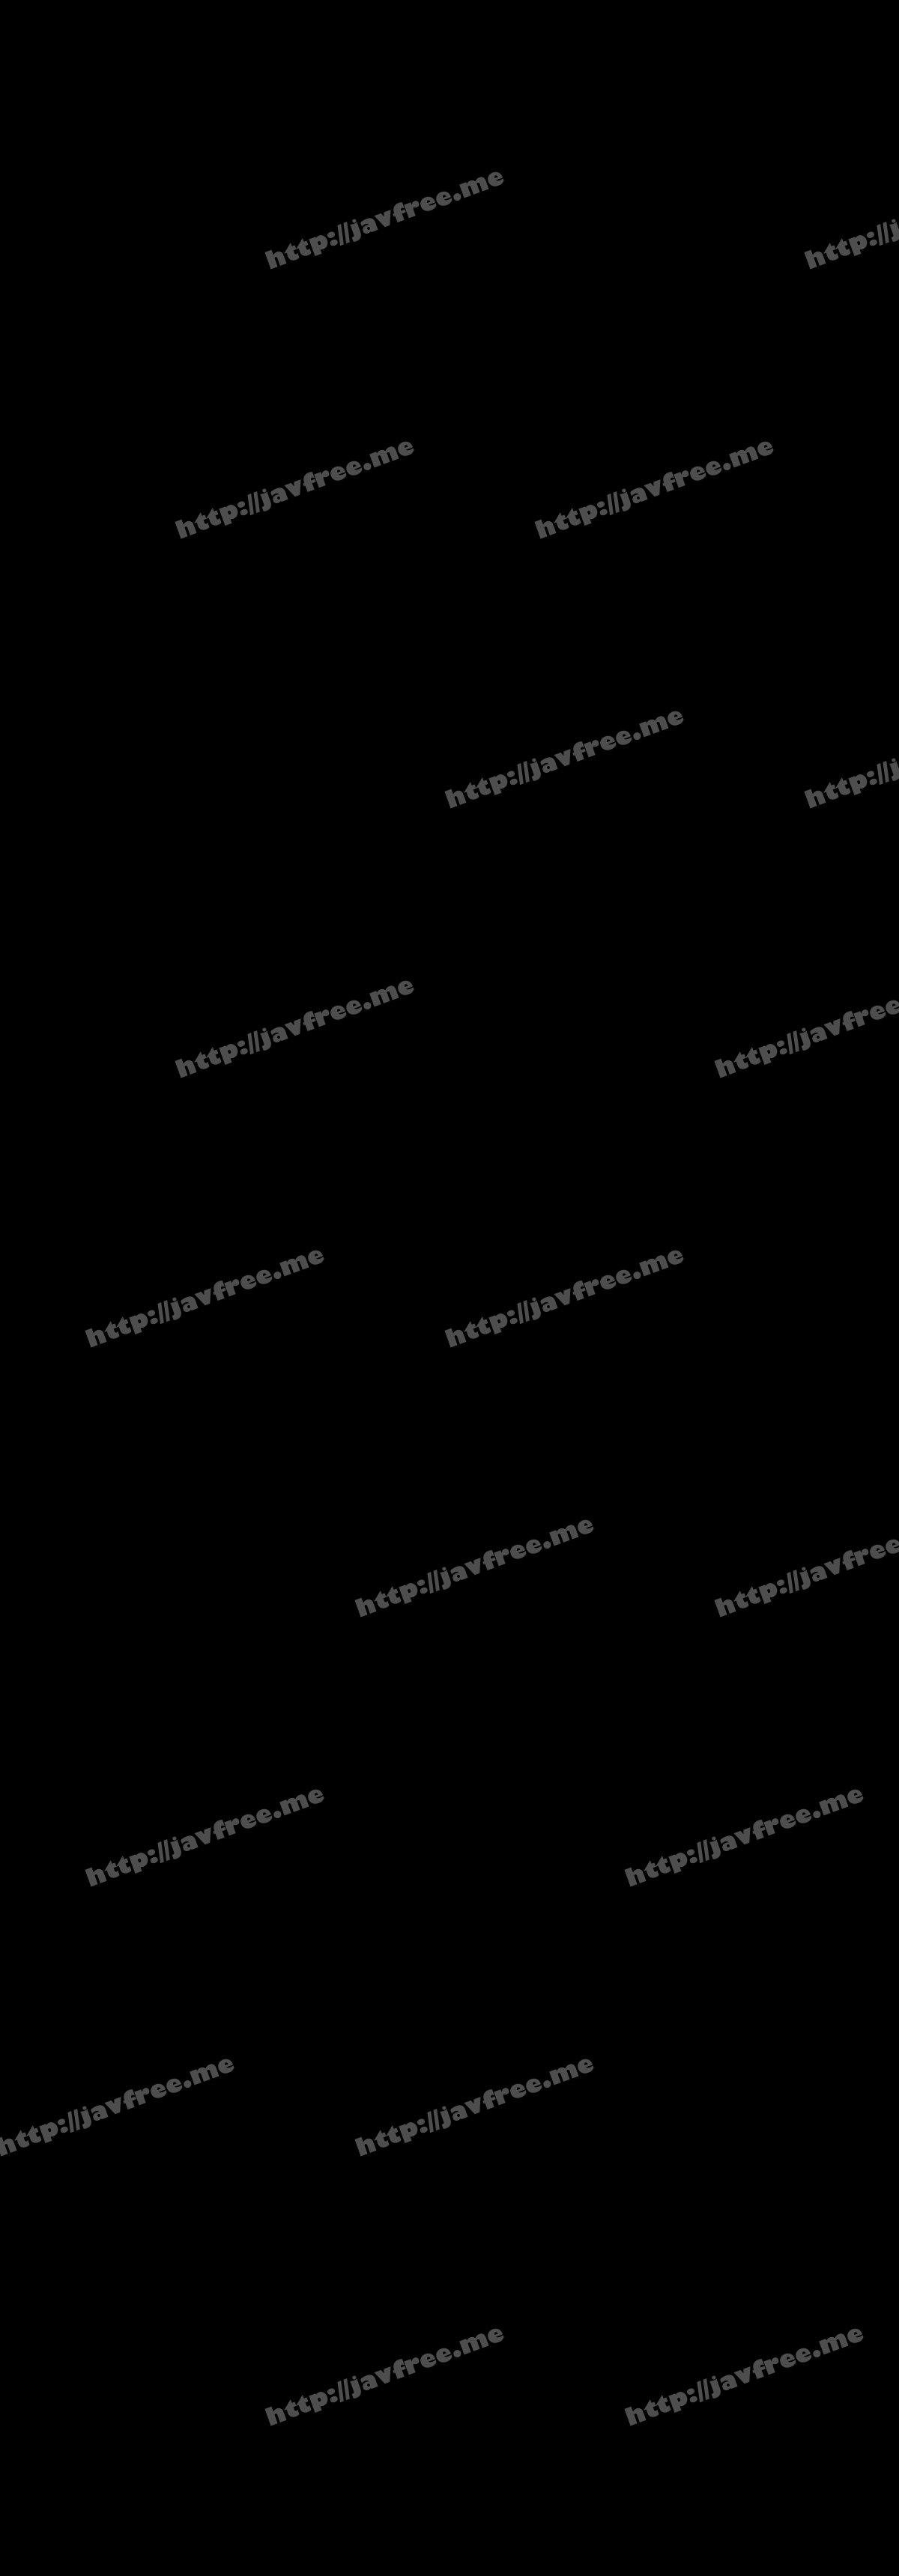 [KIWVR-046] 【VR】HQ超画質革命! 【発射無制限ソープ】生ハメ神対応の美巨乳ソープ嬢が客のチ○ポで何度もイッちゃう!! 大浦真奈美 - image 072019-966-carib on https://javfree.me